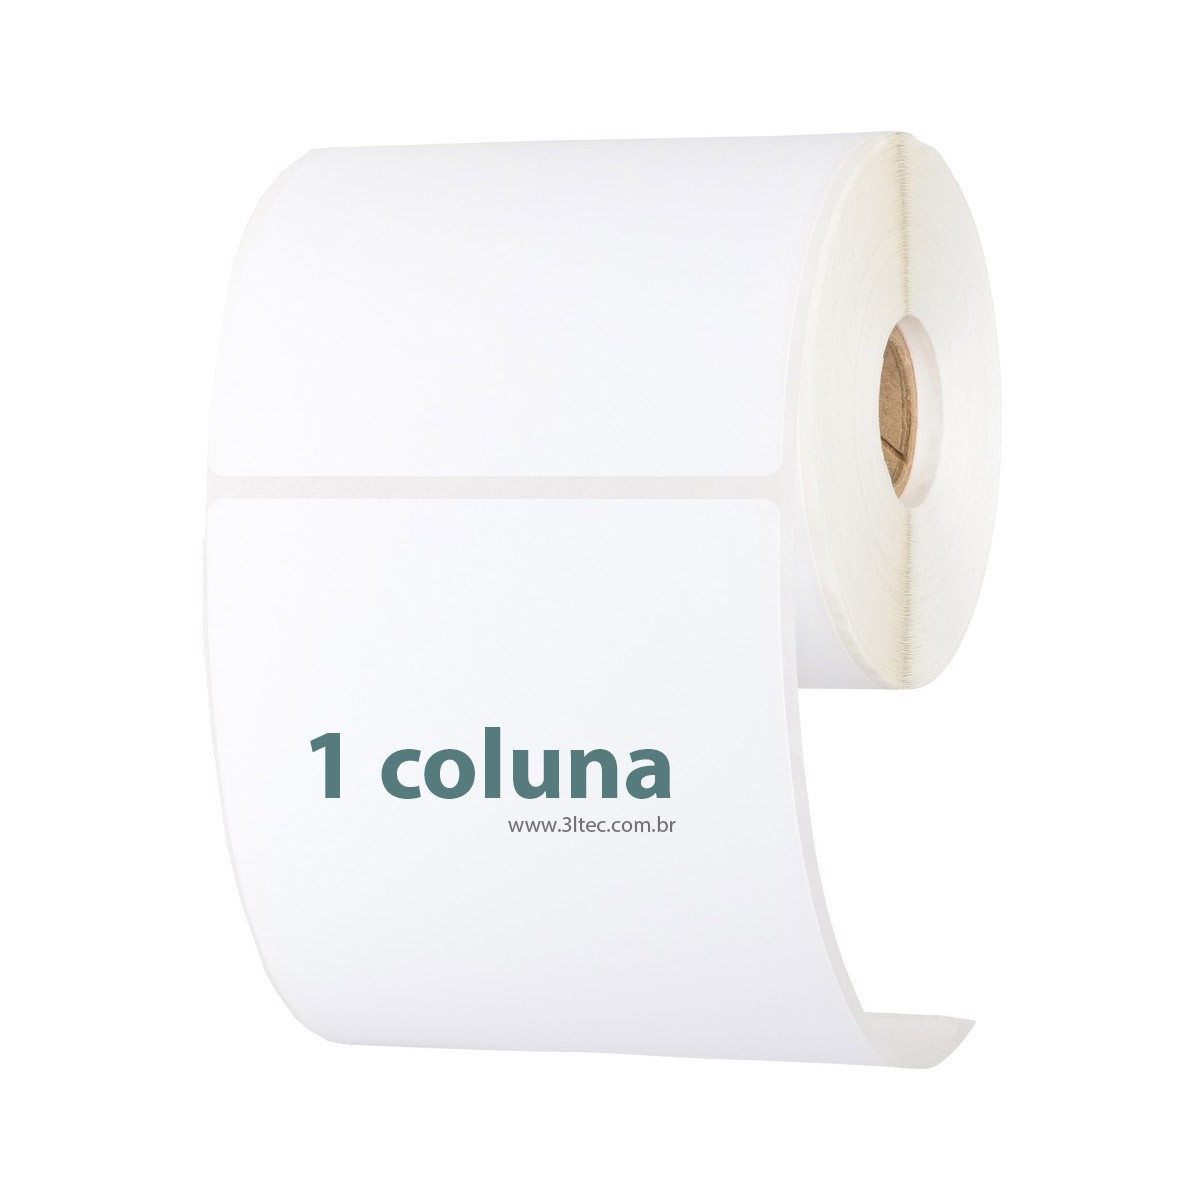 Etiquetas Adesivas - Rolo de 40 metros - 1 coluna, Faturamento minimo de 10 rolos